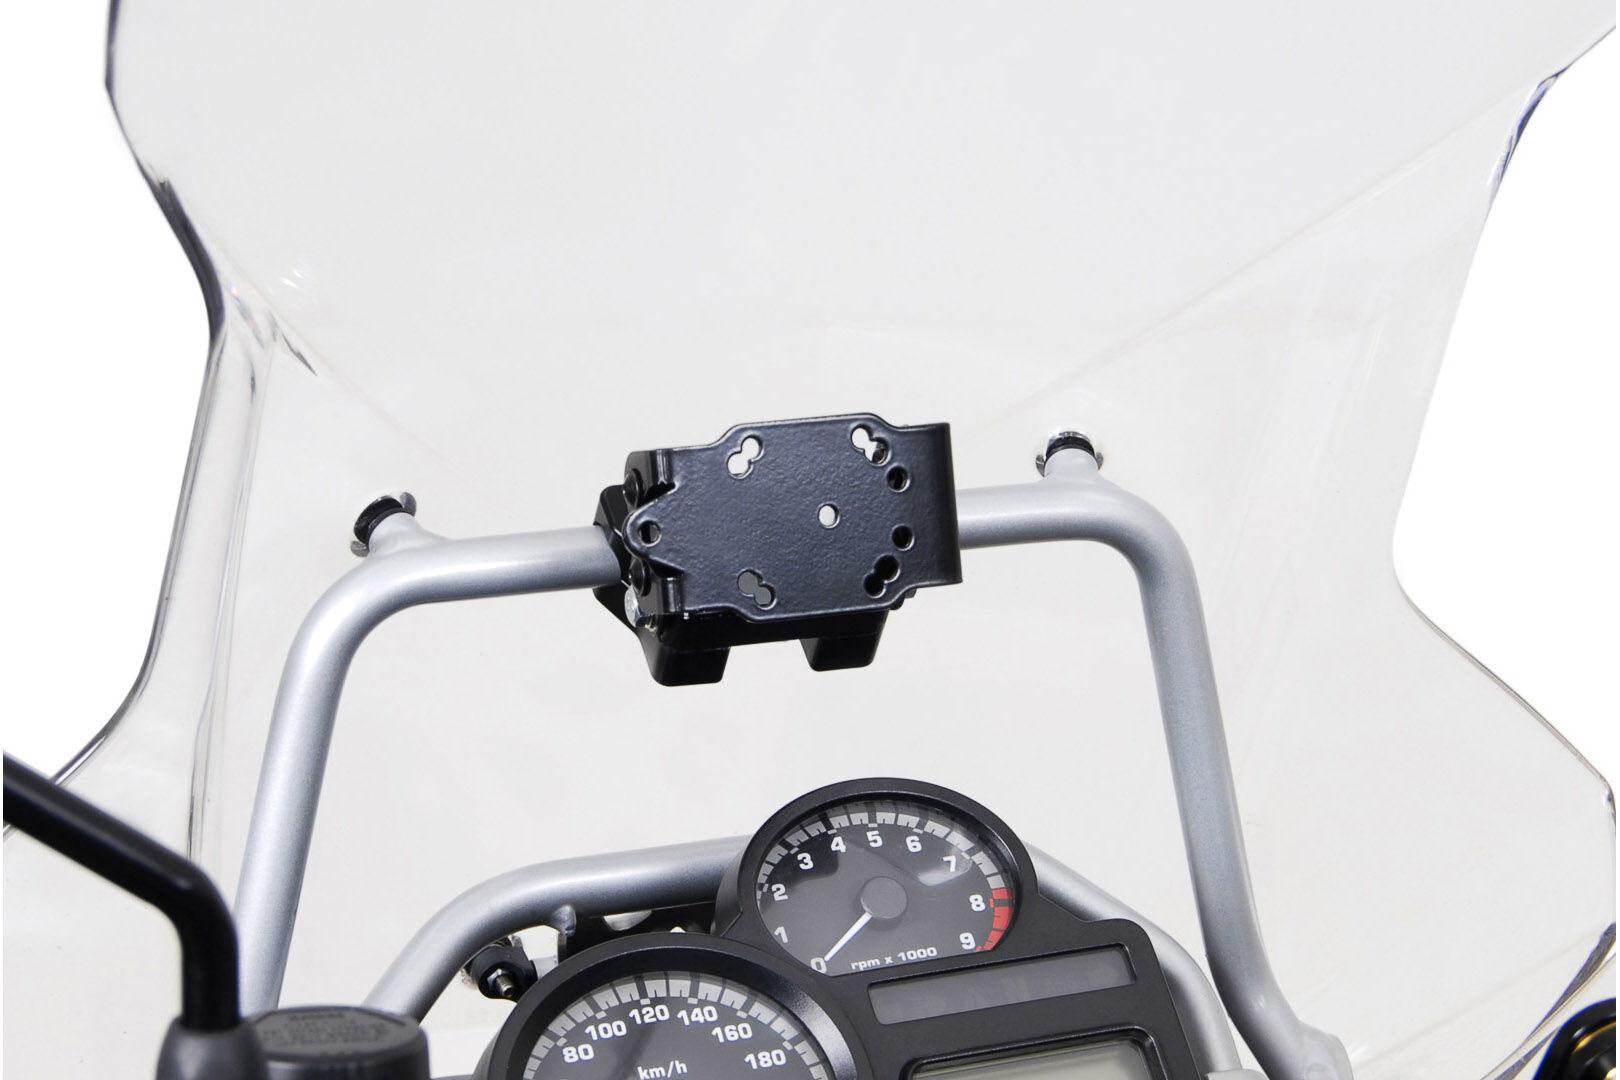 SW-Motech Supporto di GPS per traversa Ø 17 mm urto assorbente - BM...